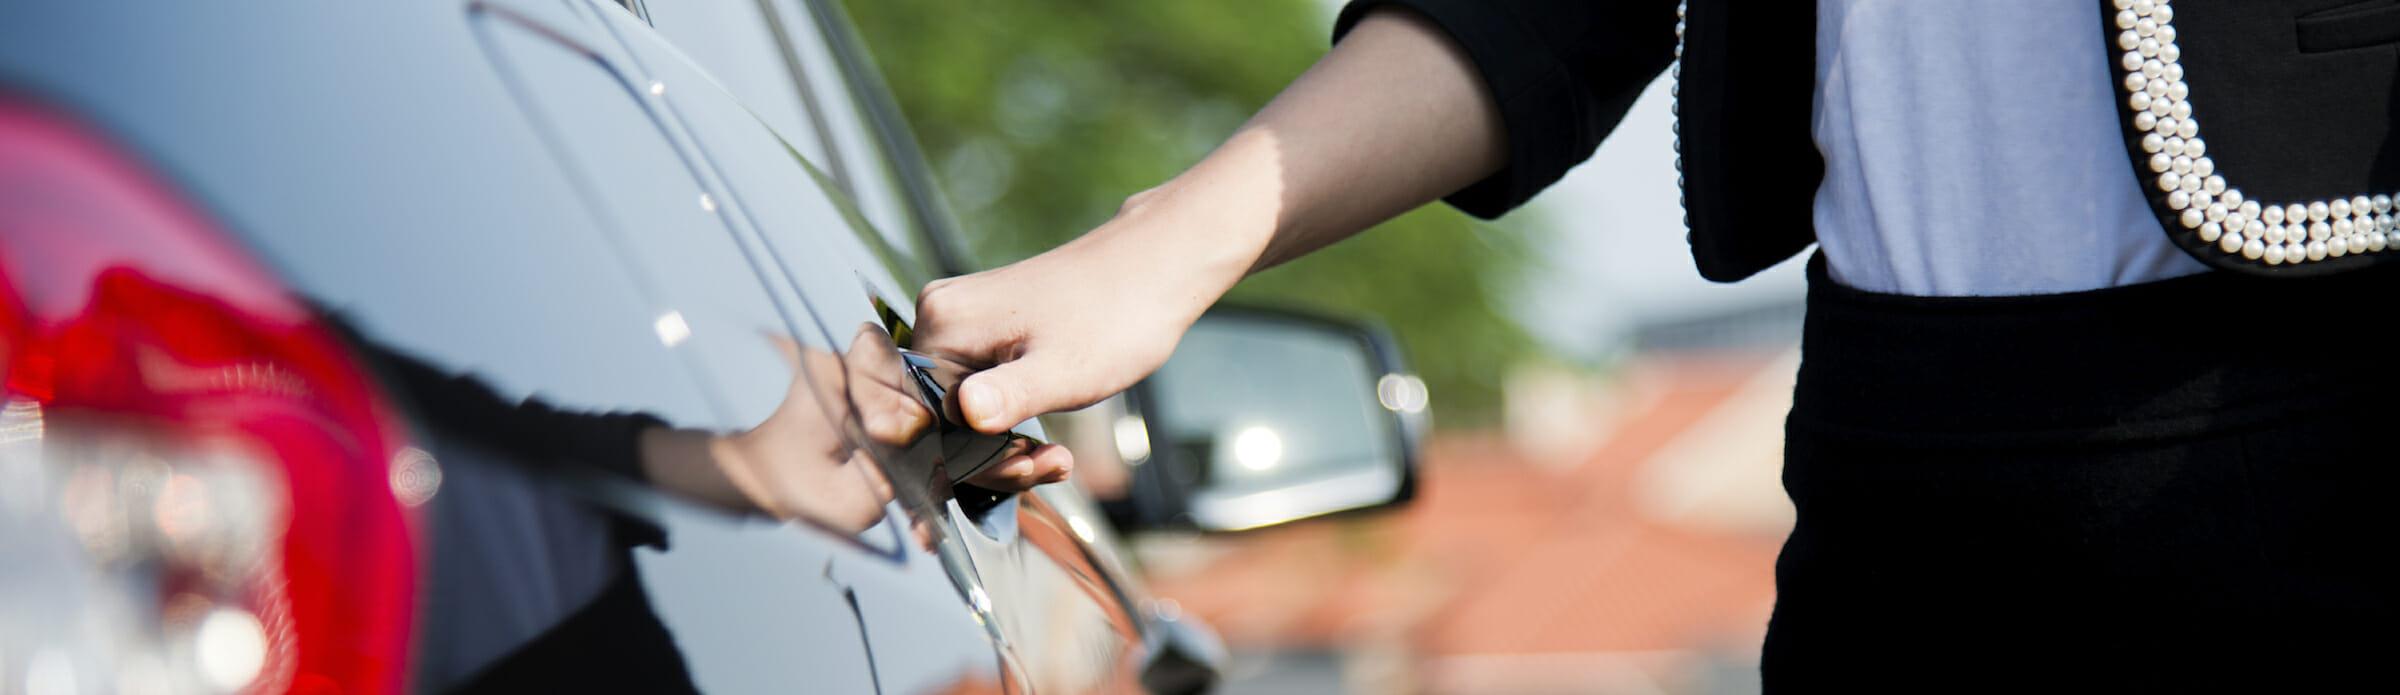 Closeup of a businesswoman opening a car door.